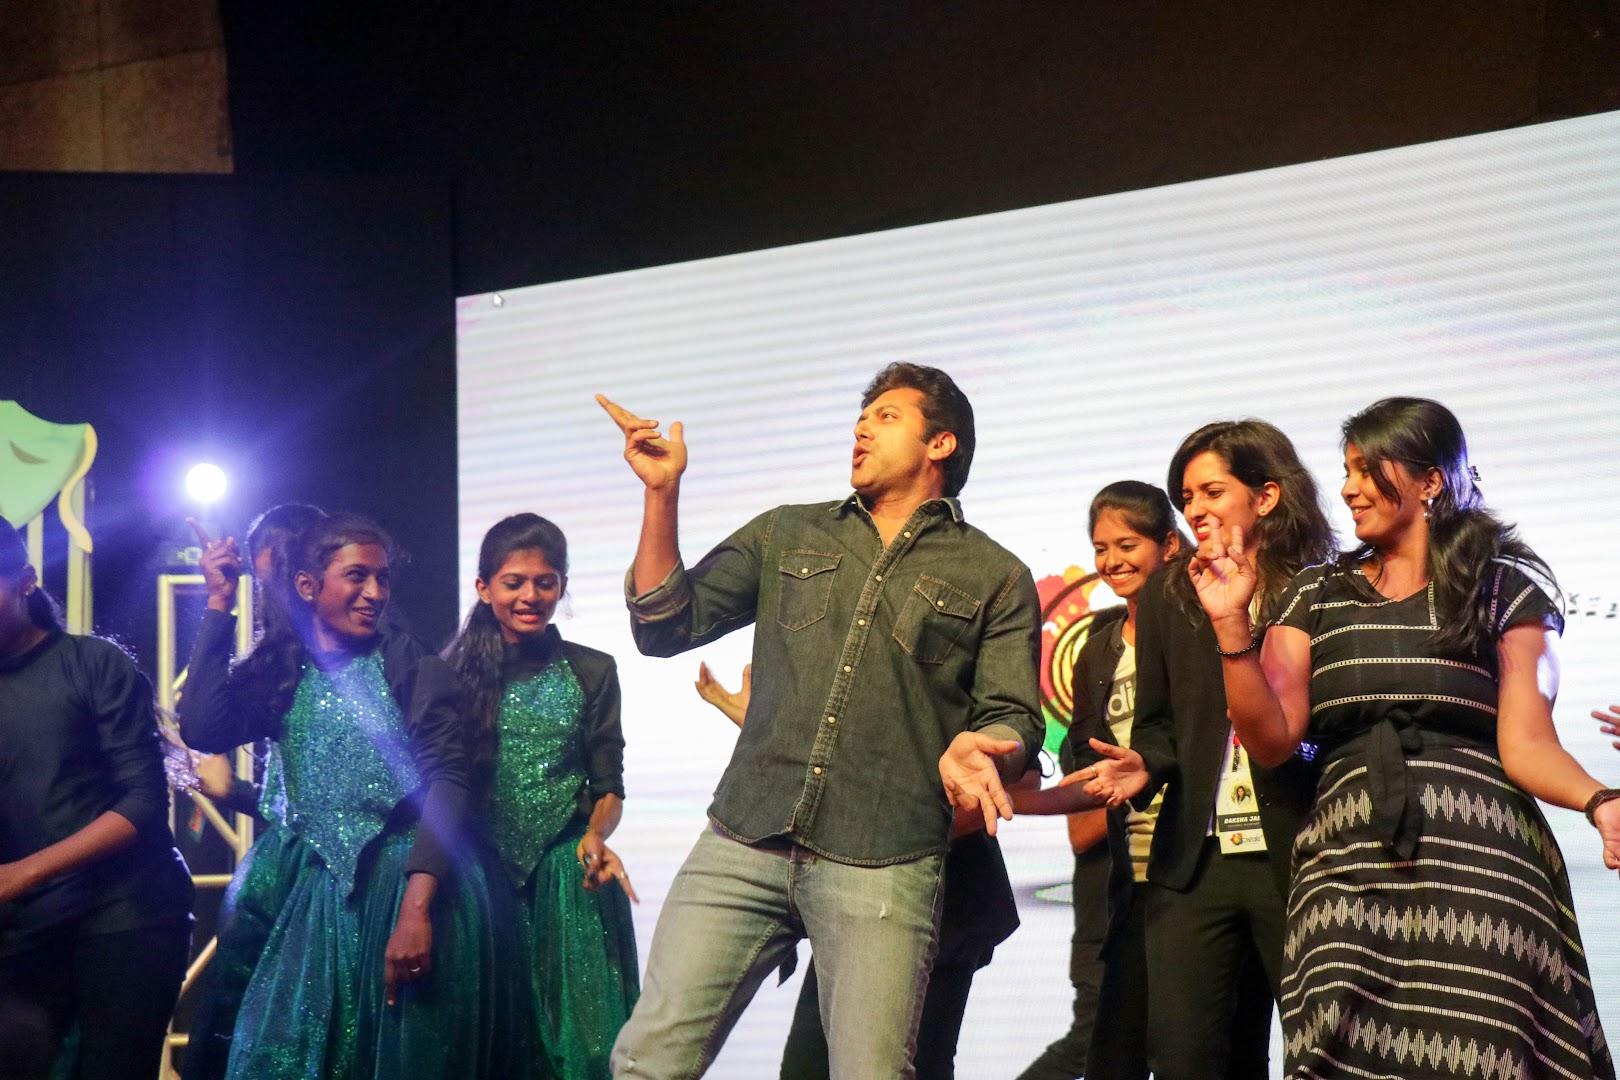 INTER-COLLEGIATE CULTURAL FEST – MIRAKI 2K19, Chennai